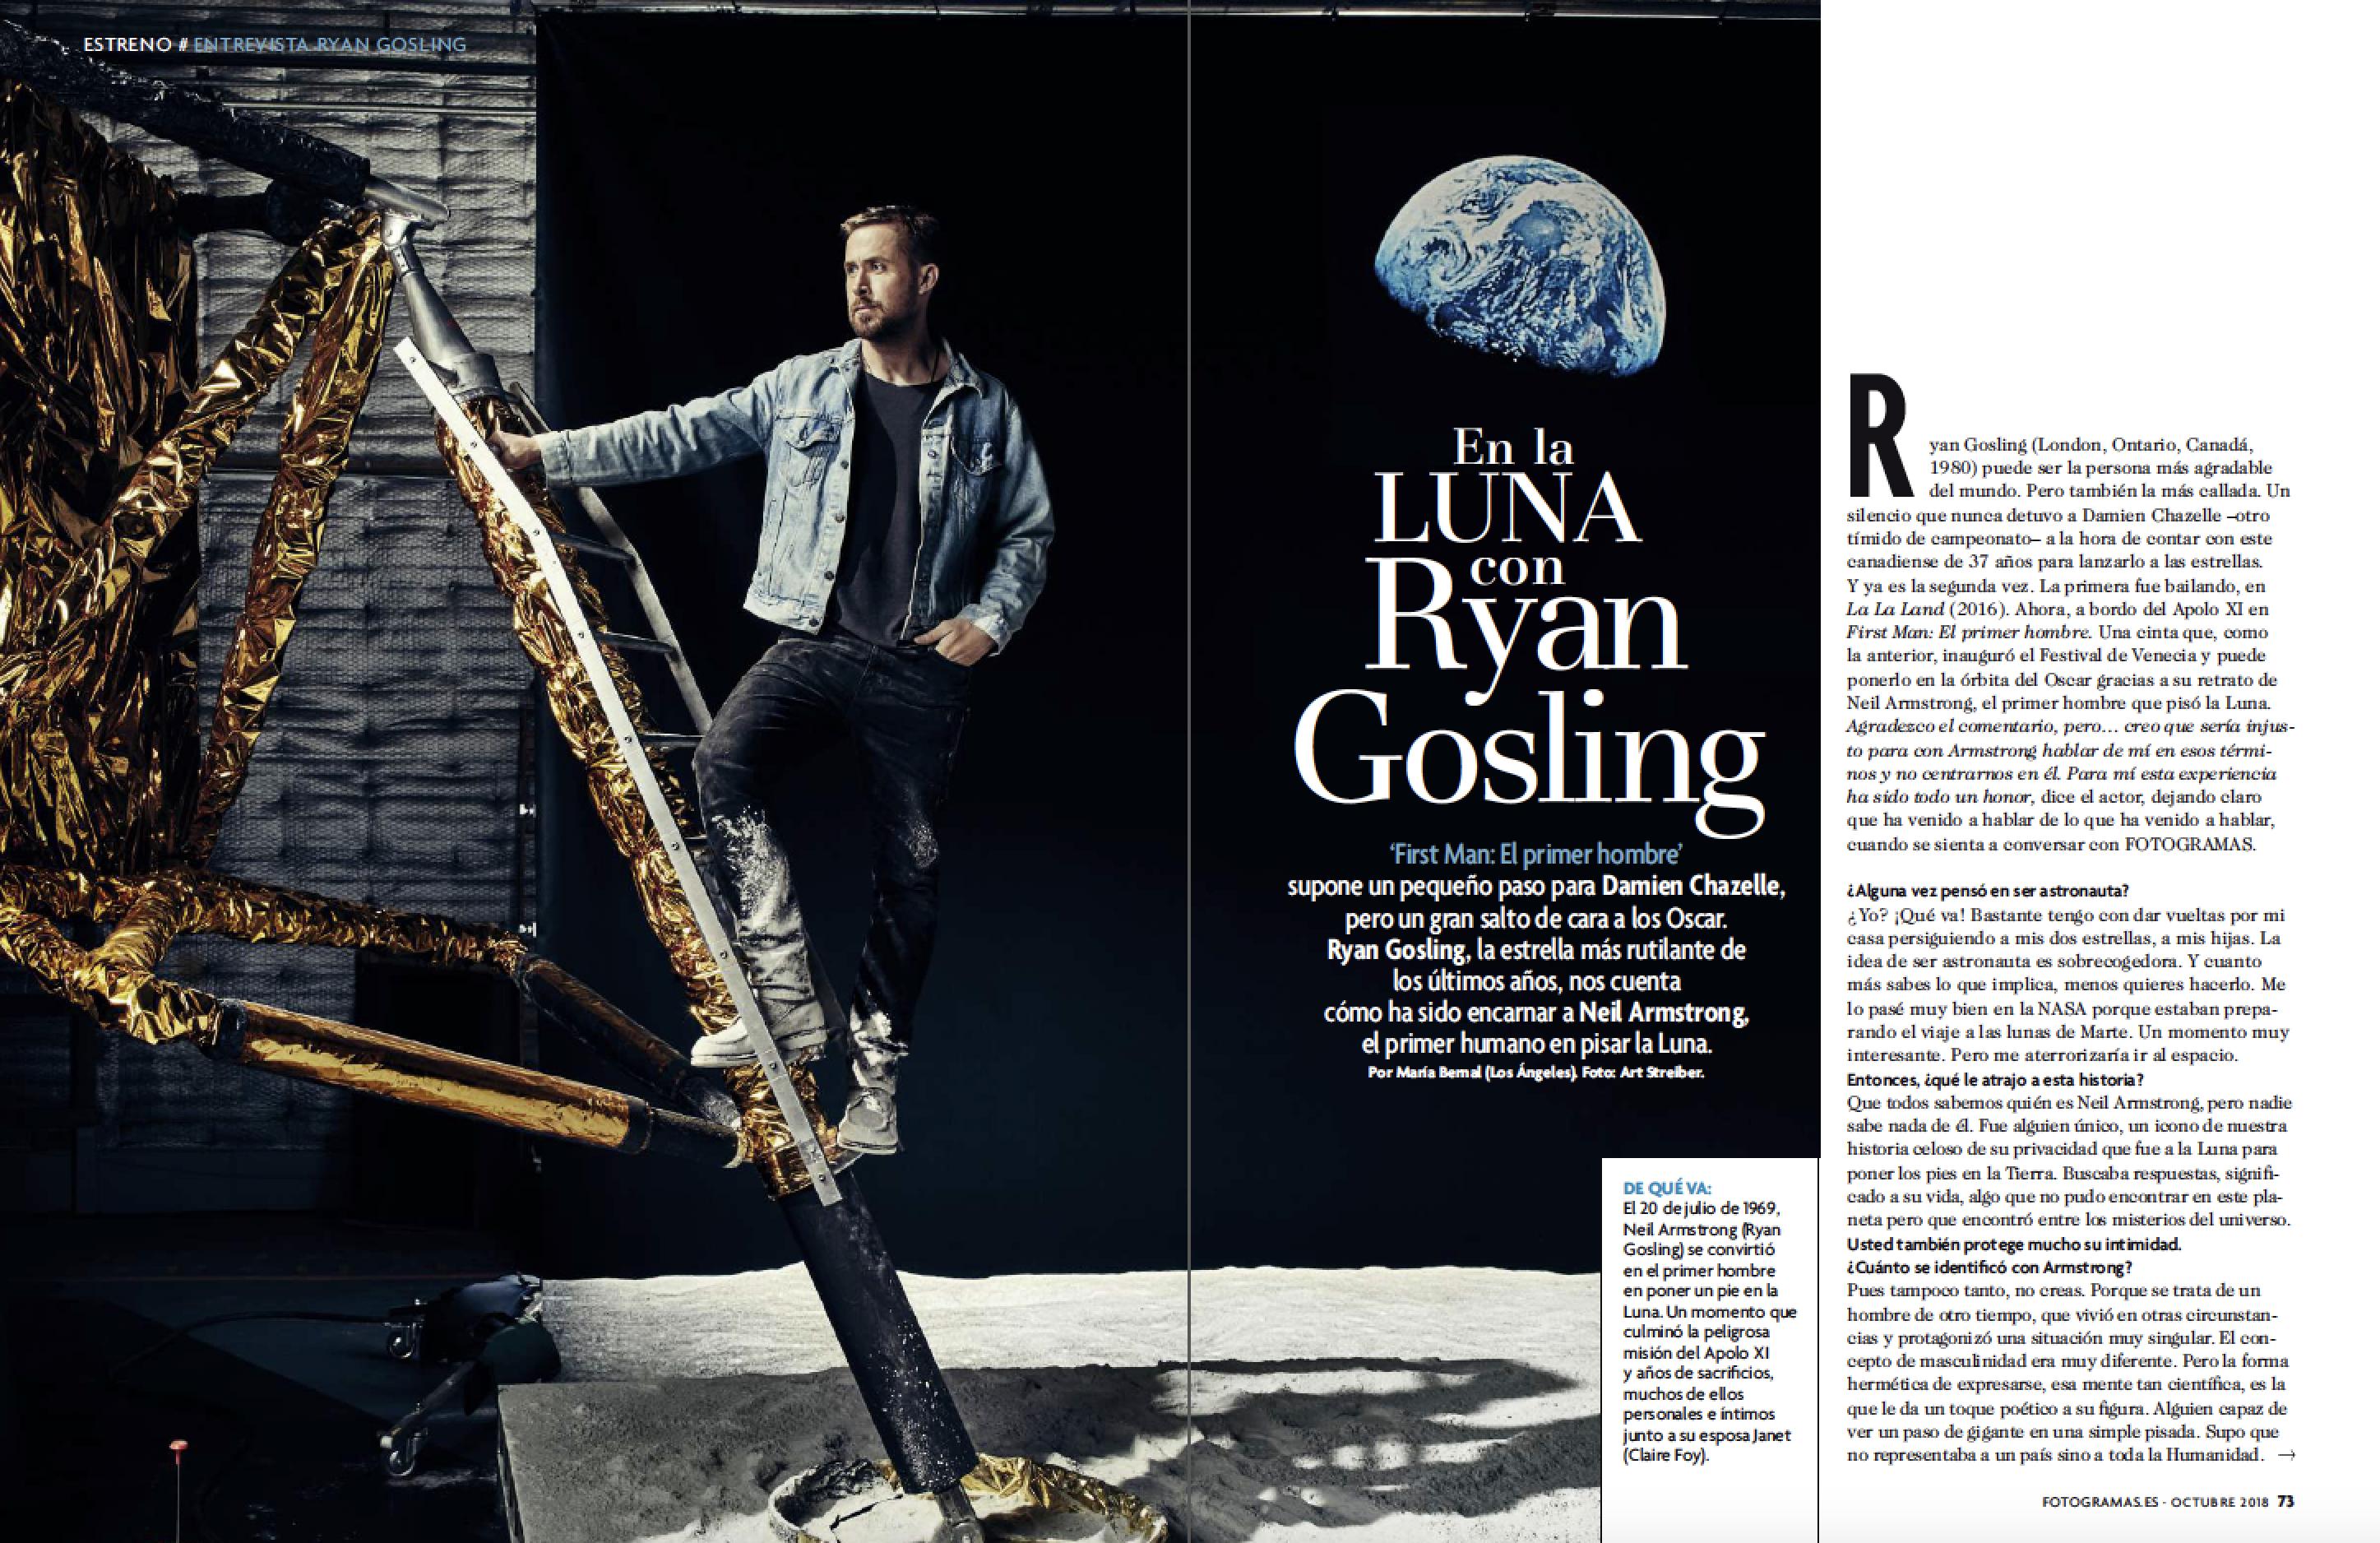 Ryan Gossling en 'First Man: El primer hombre'